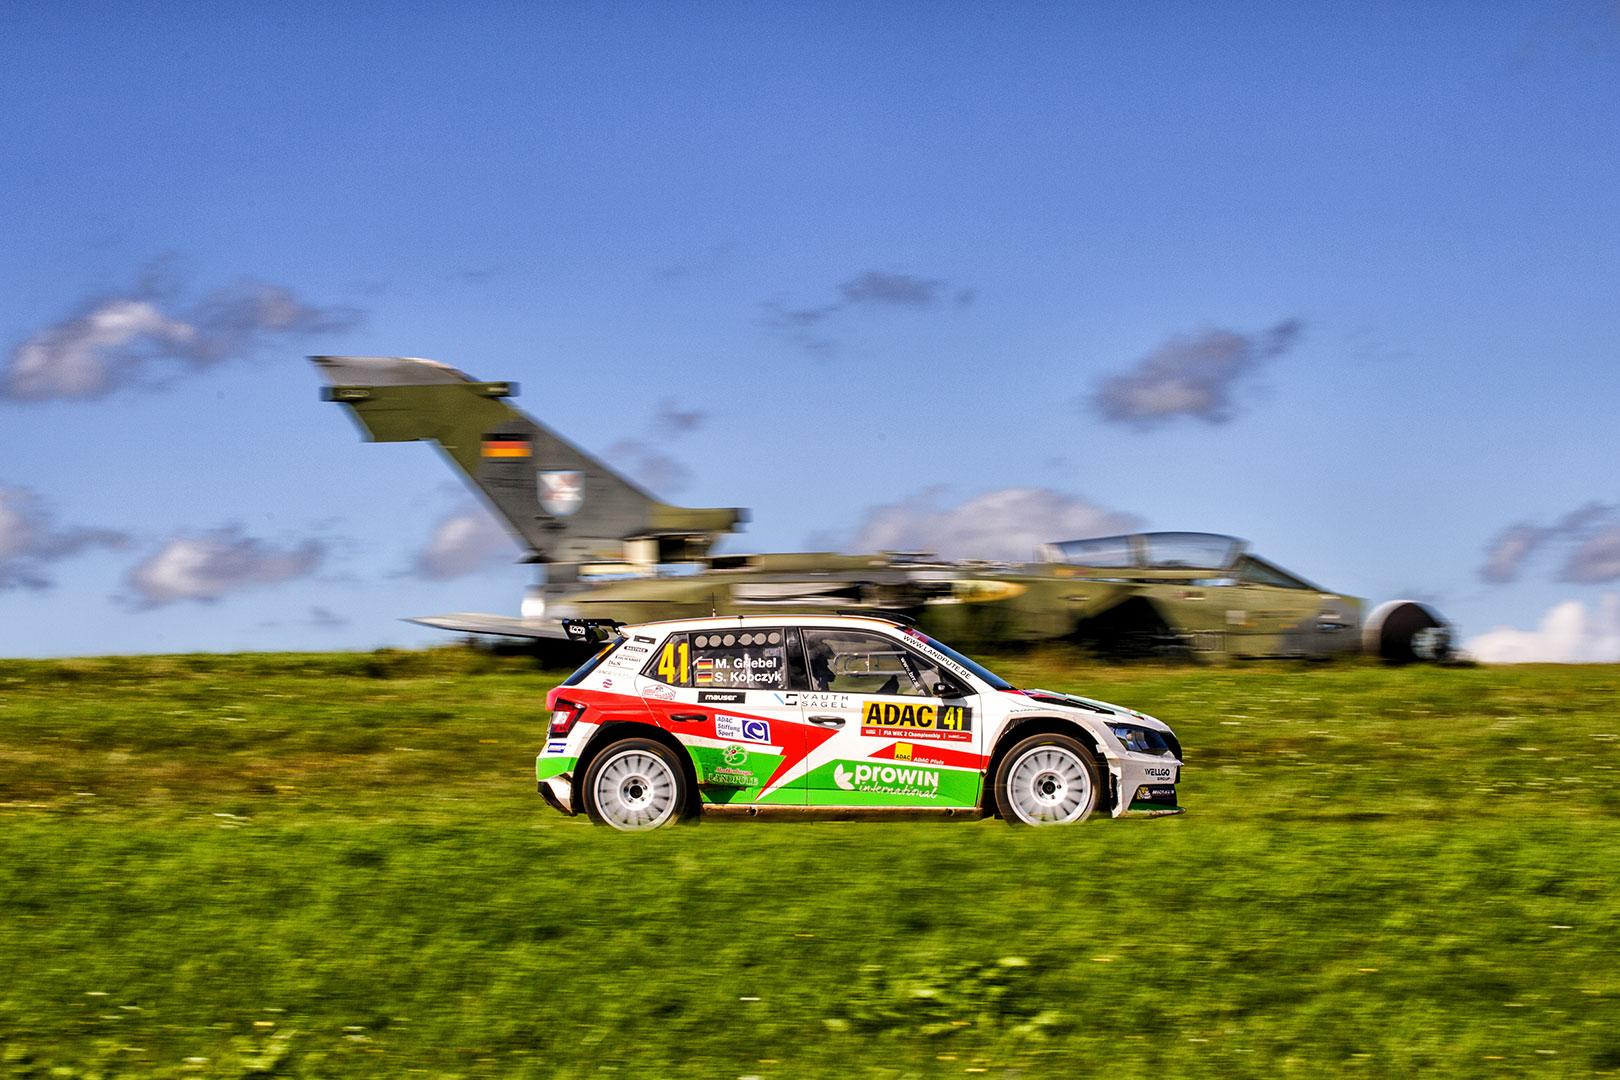 Marijan Griebel / Stefan Kopczyk, ŠKODA FABIA R5, BRR Baumschlager Rallye & Racing Team. Rallye Deutschland 2017